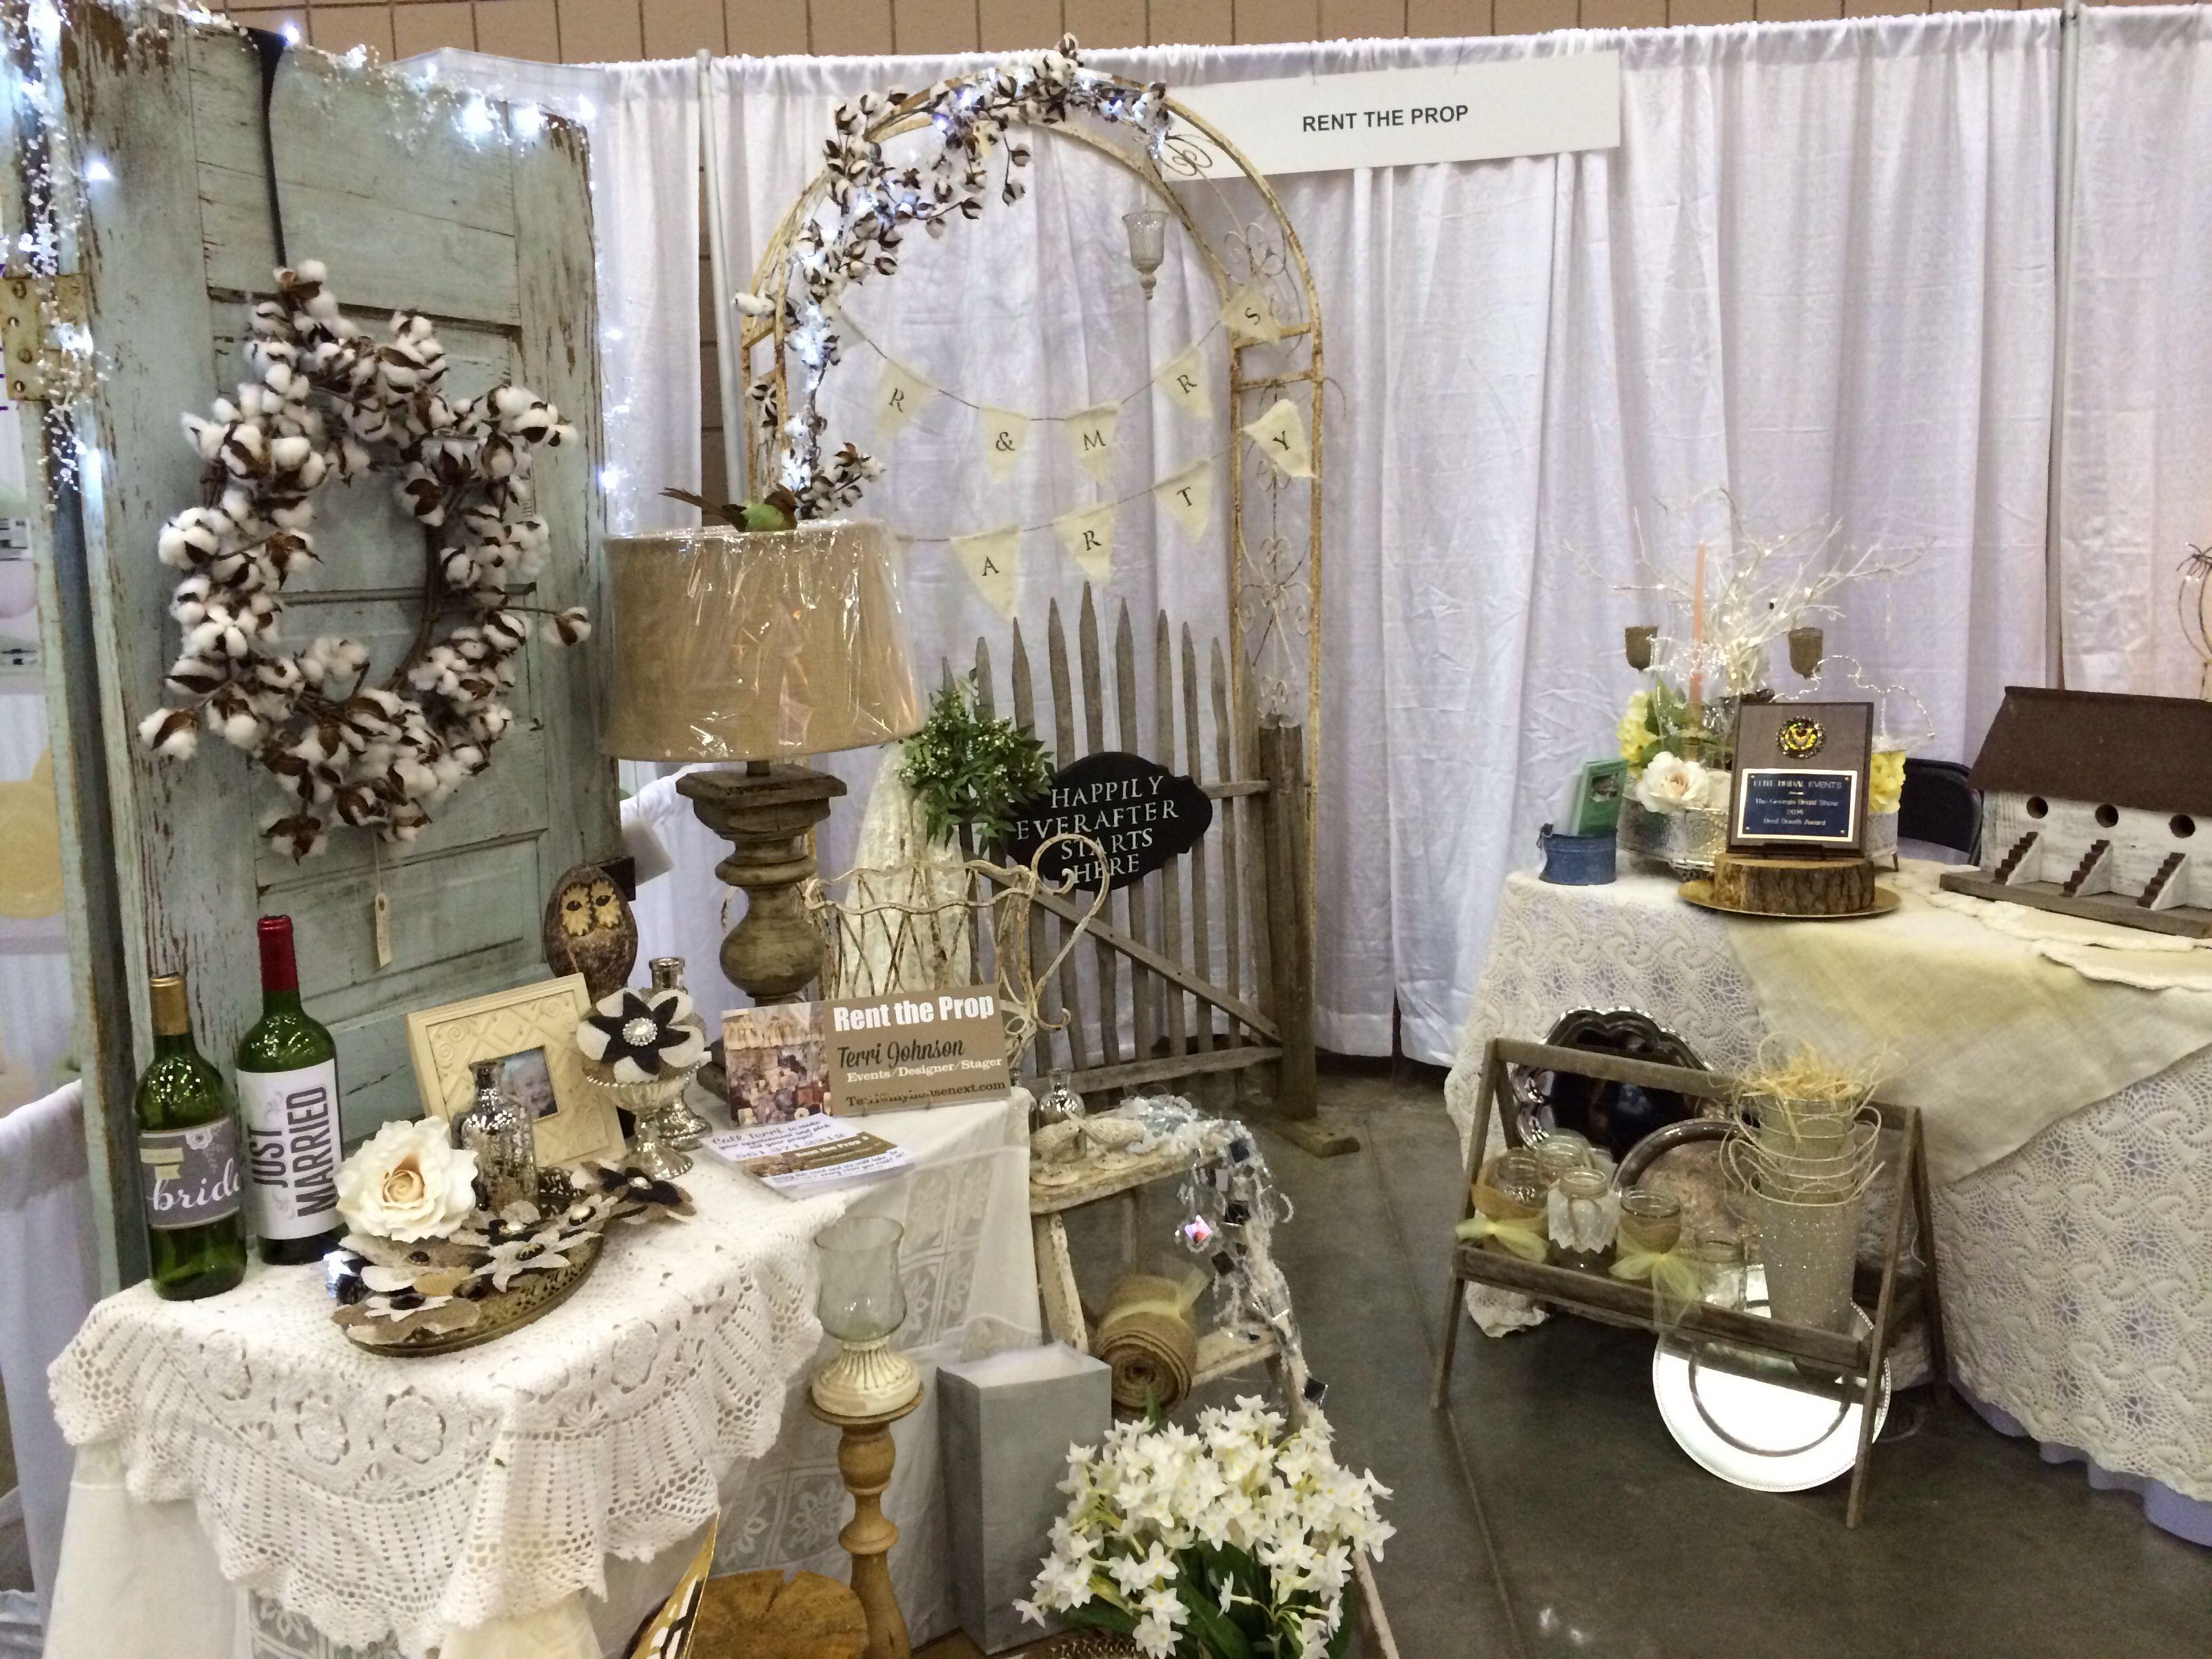 Rent The Prop Georgia Bridal Show In Atlanta 3 2 14 Bridal Show Bridal Expo Wedding Expo